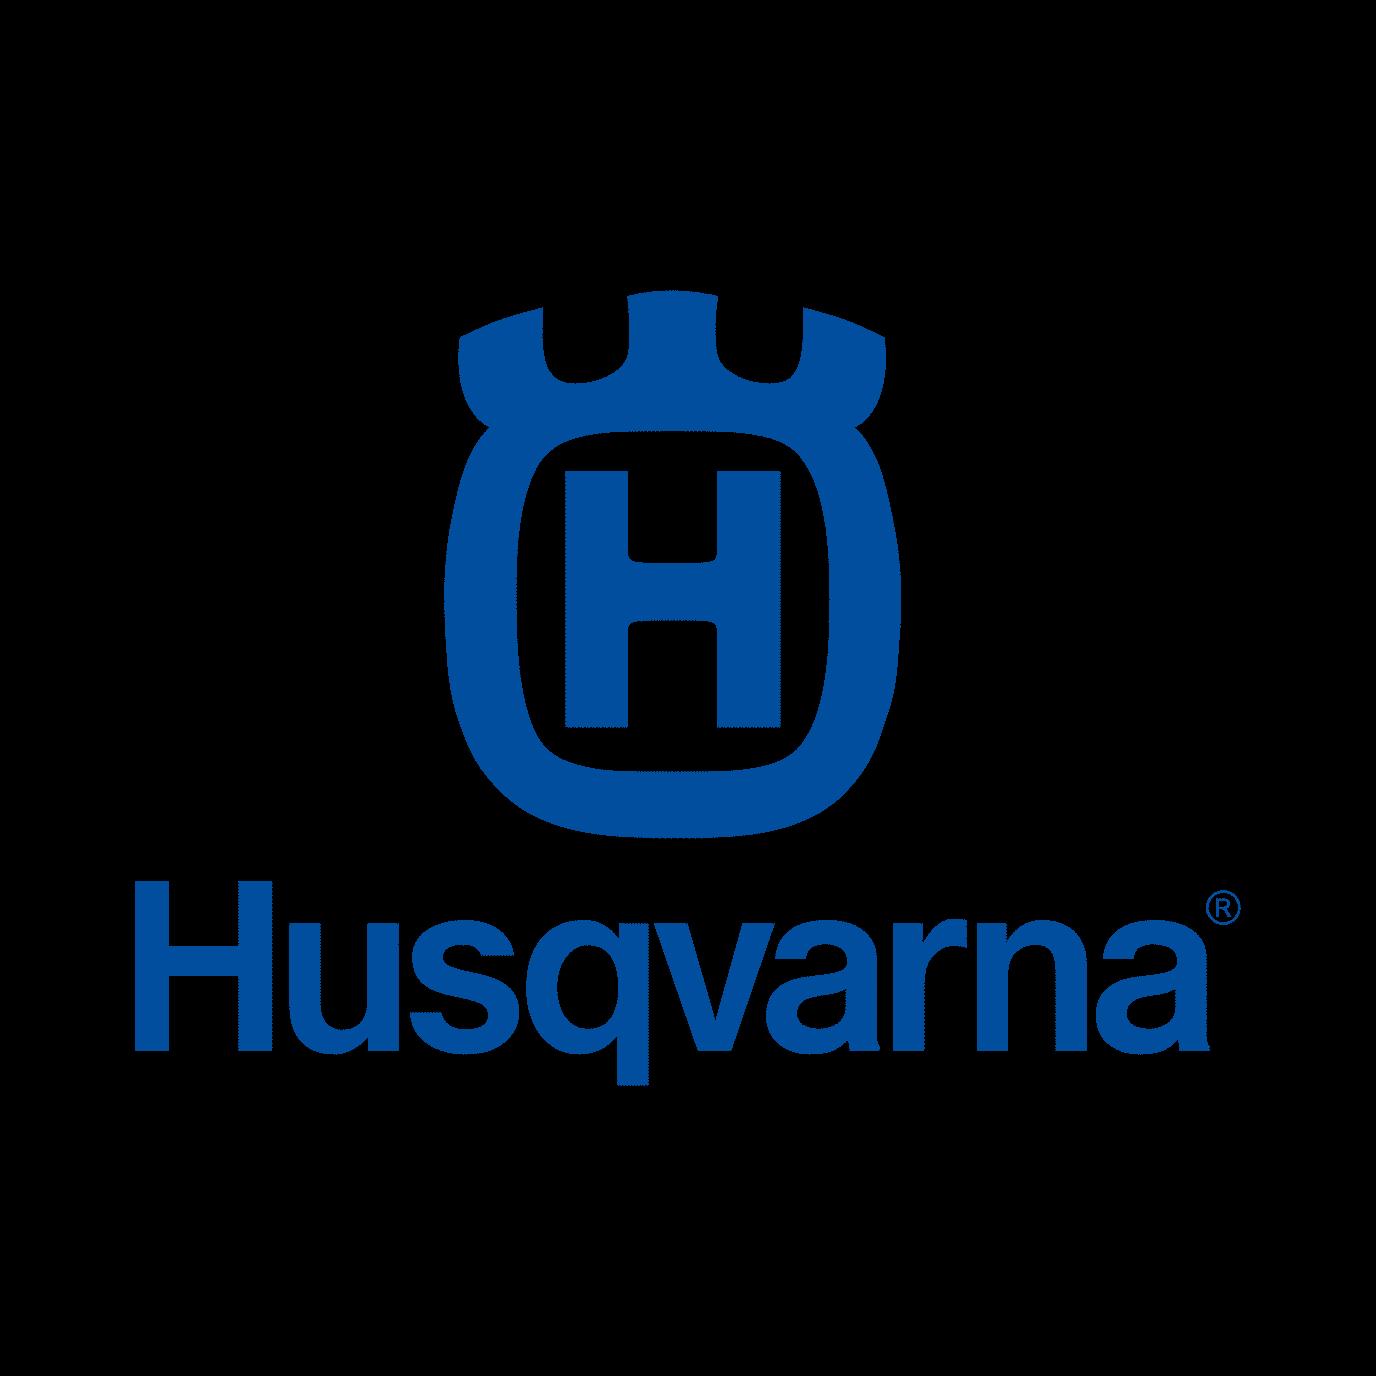 husqvarna cliente drones sky zoom